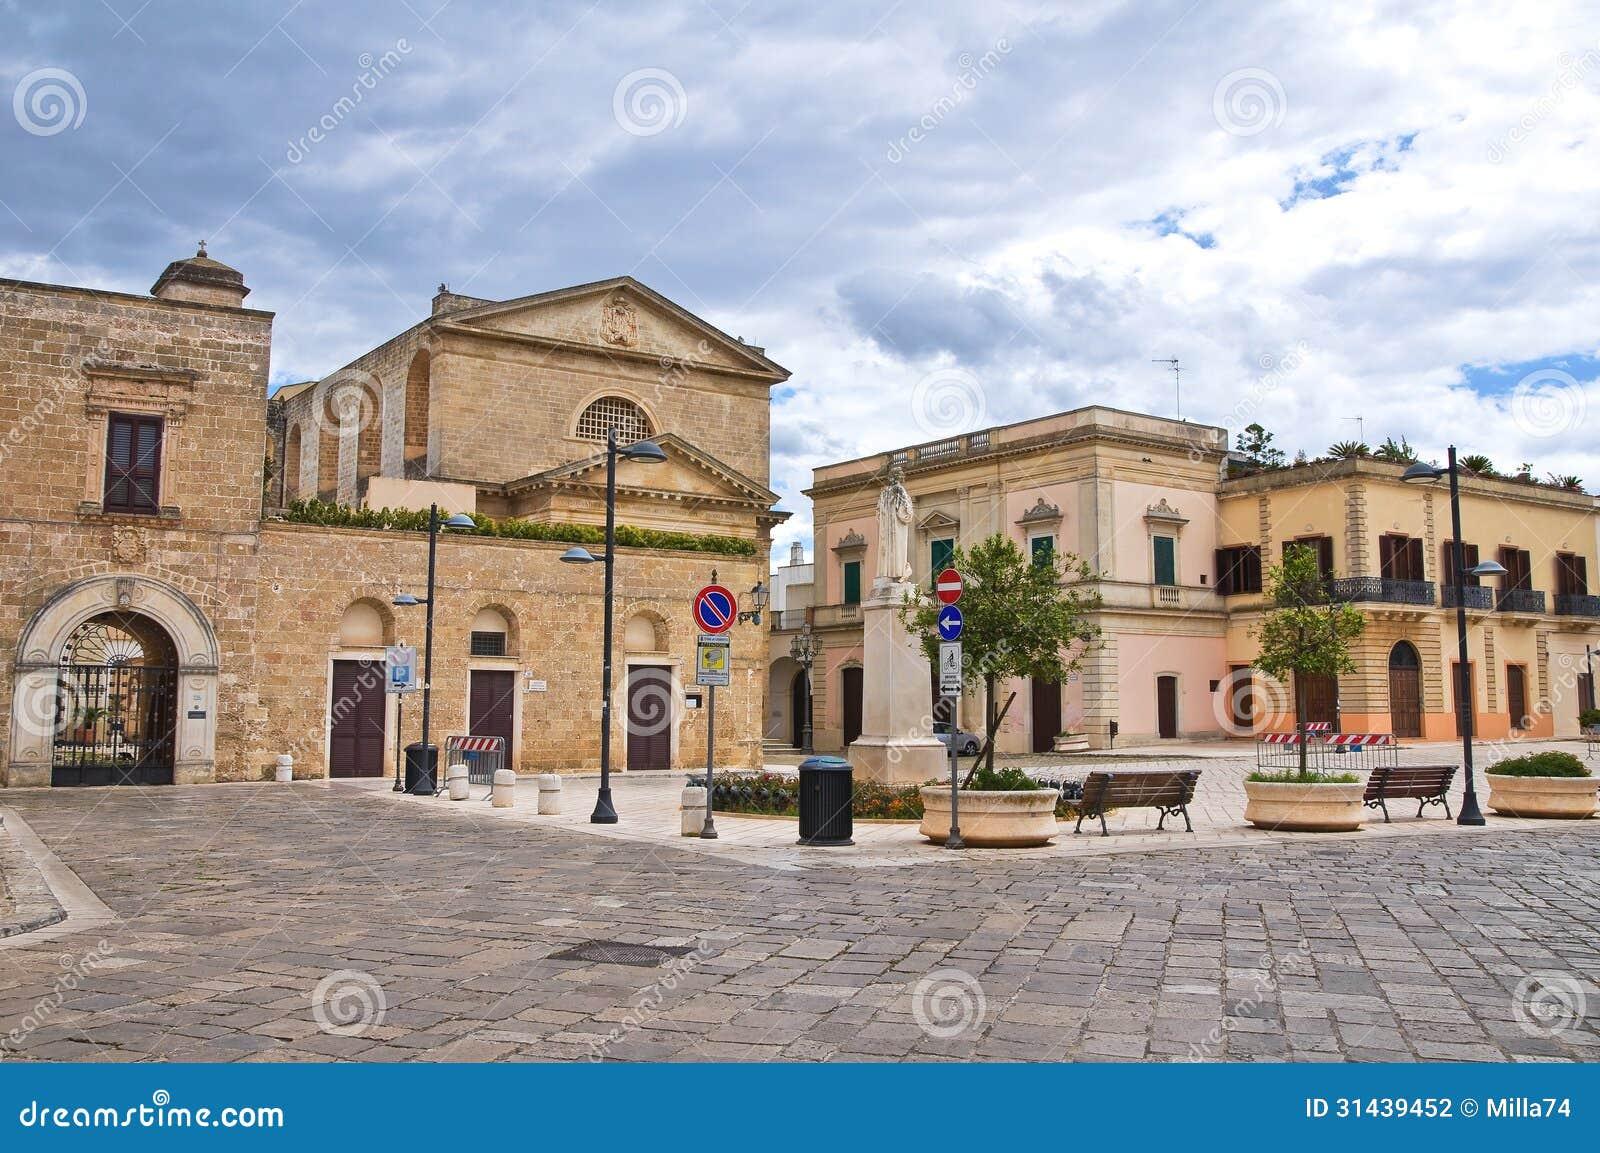 Alleyway. Ugento. Puglia. Włochy.